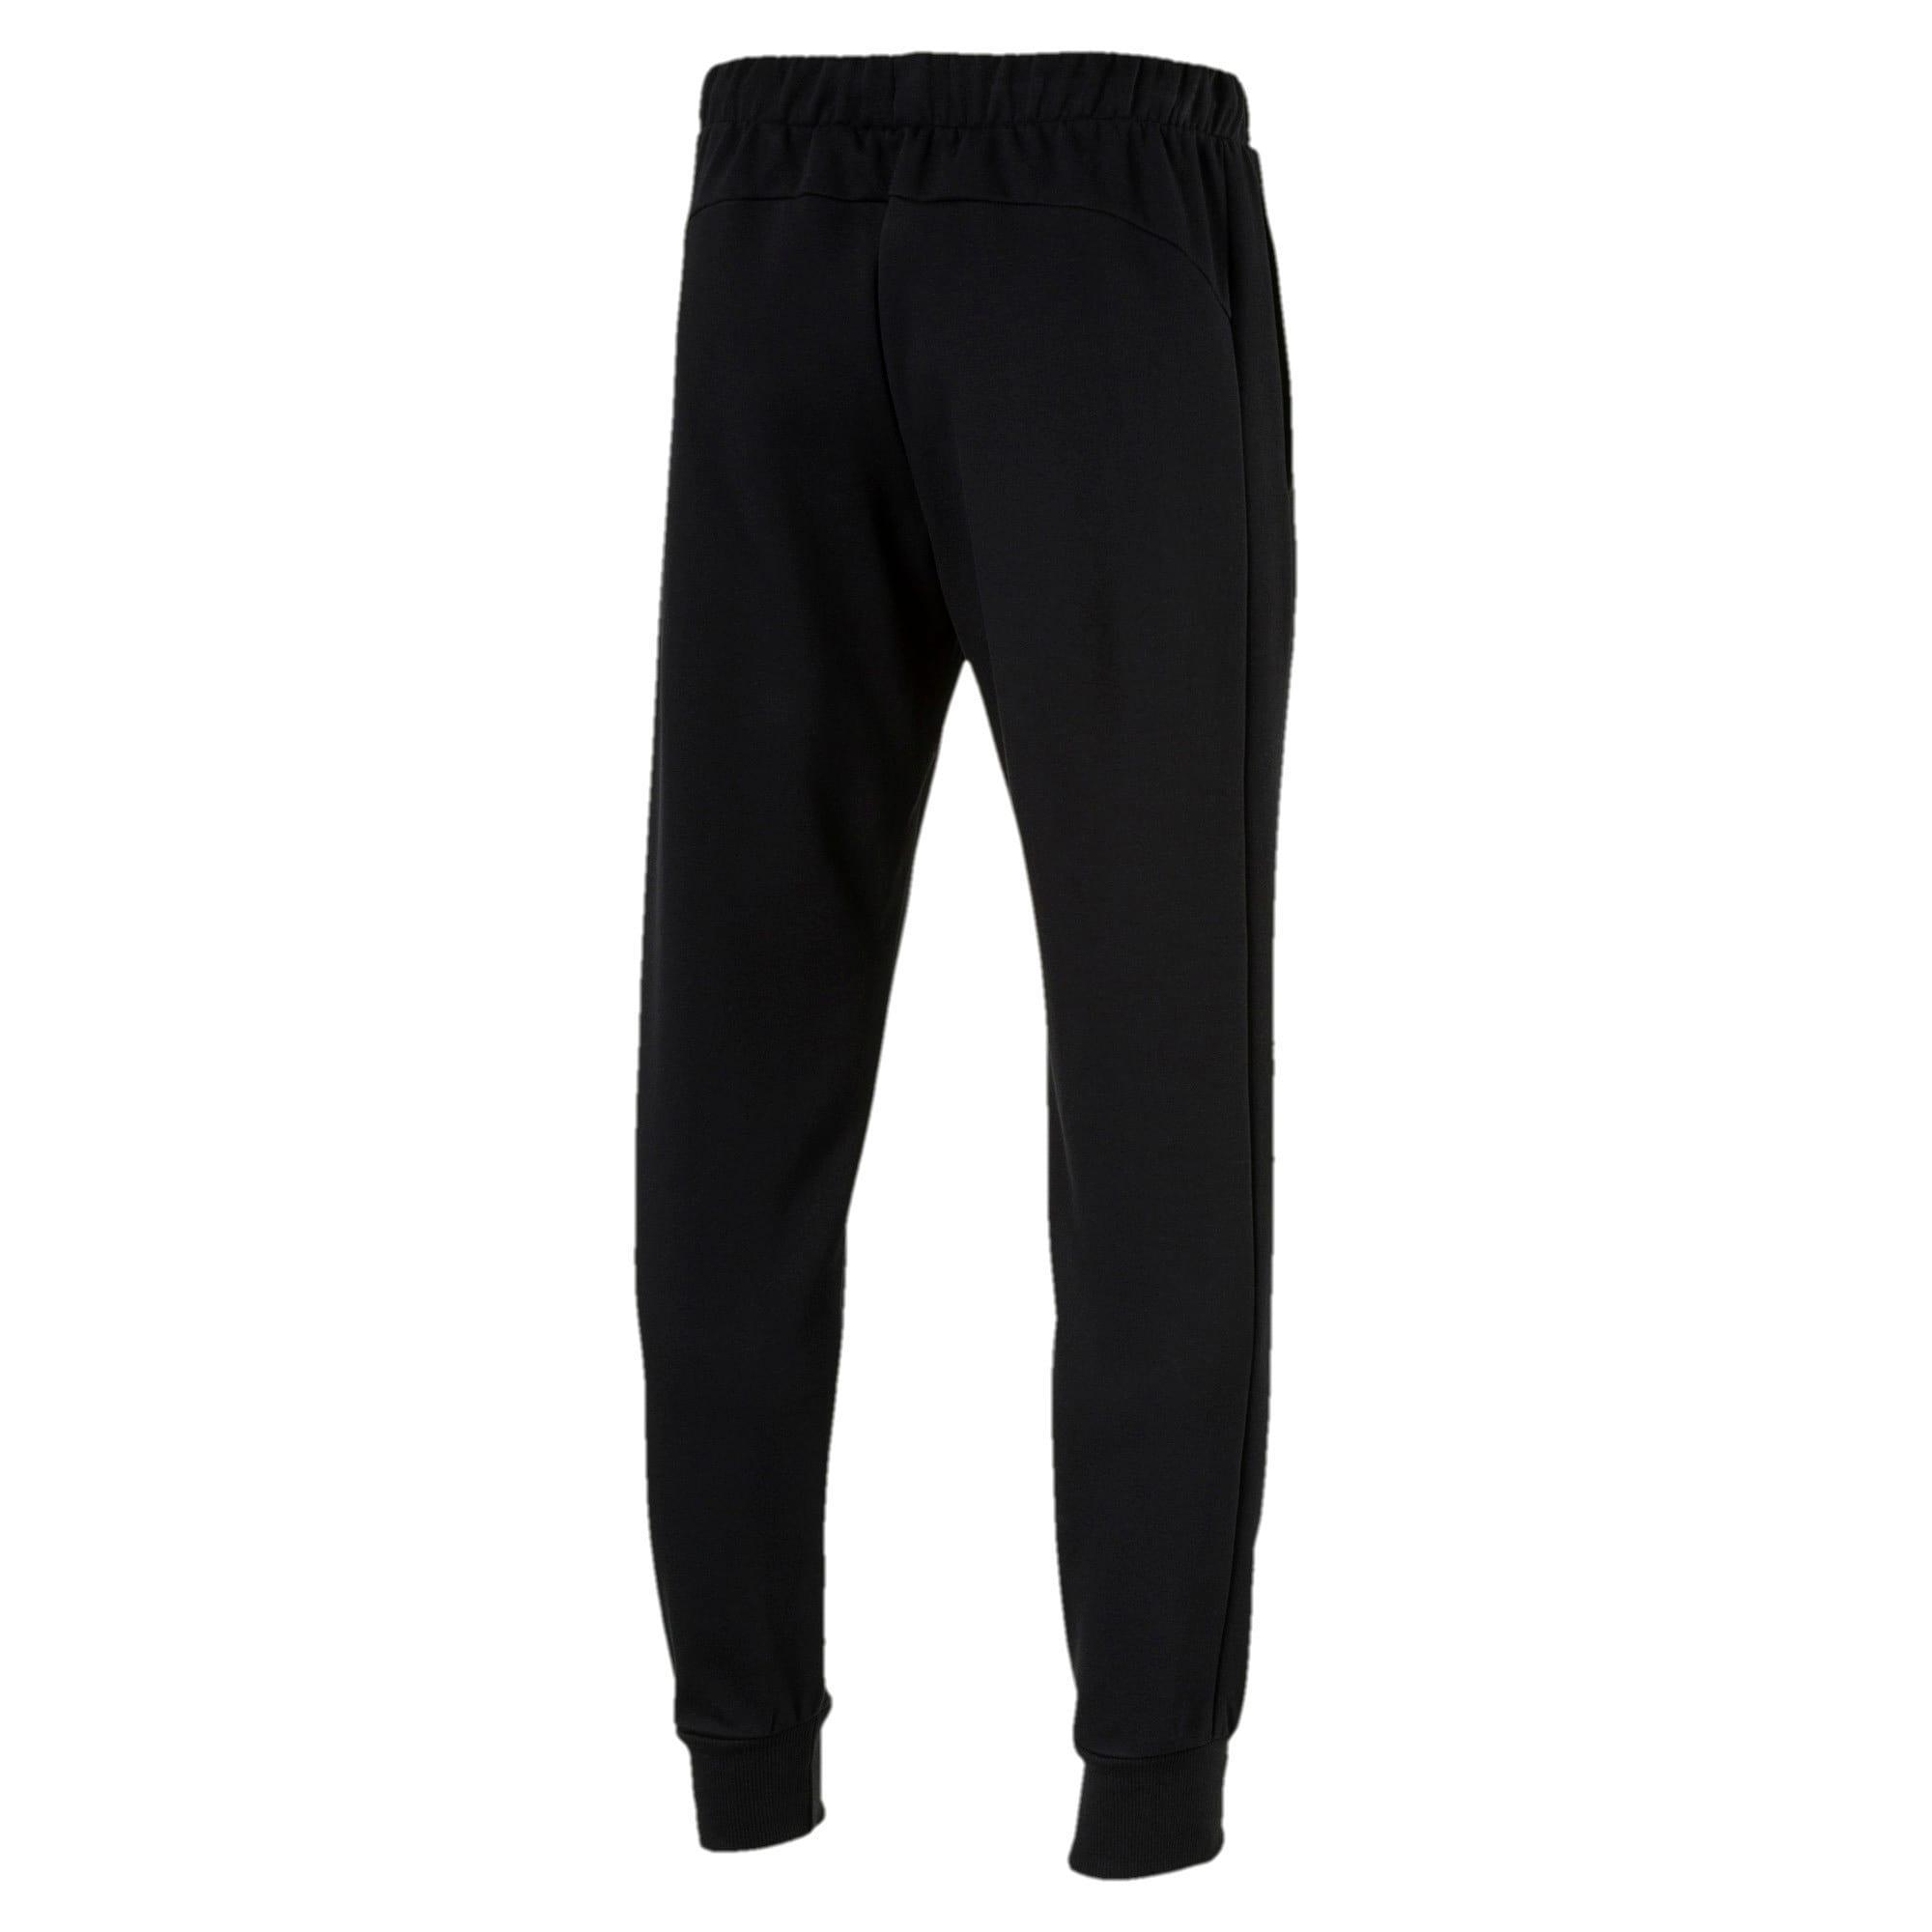 Thumbnail 2 of P48 Modern Sports Pants, Cotton Black, medium